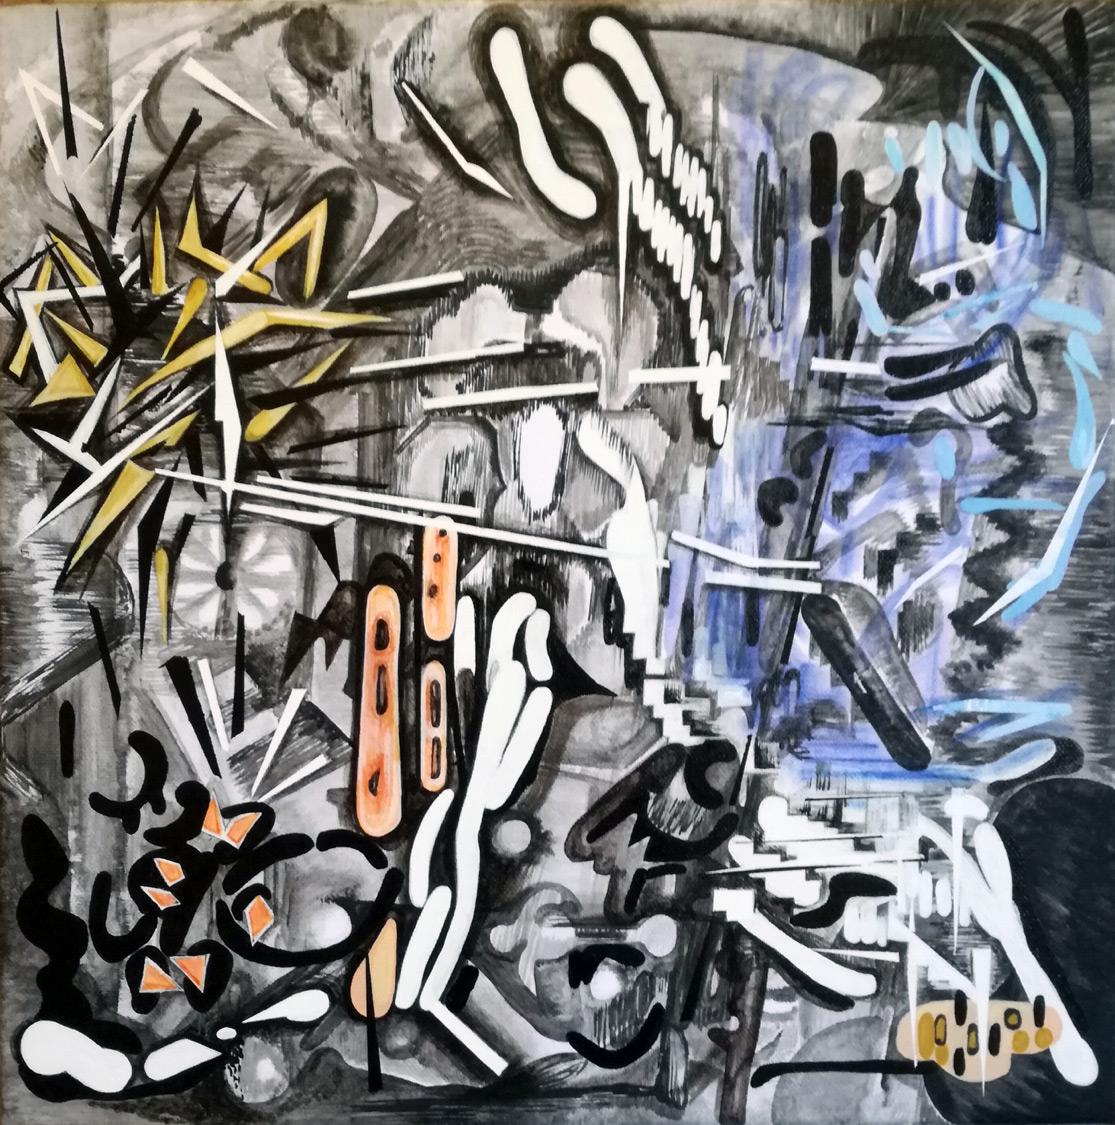 Vana Fertaki, Space, Varnish and oil on canvas, 40x40 cm, 2020